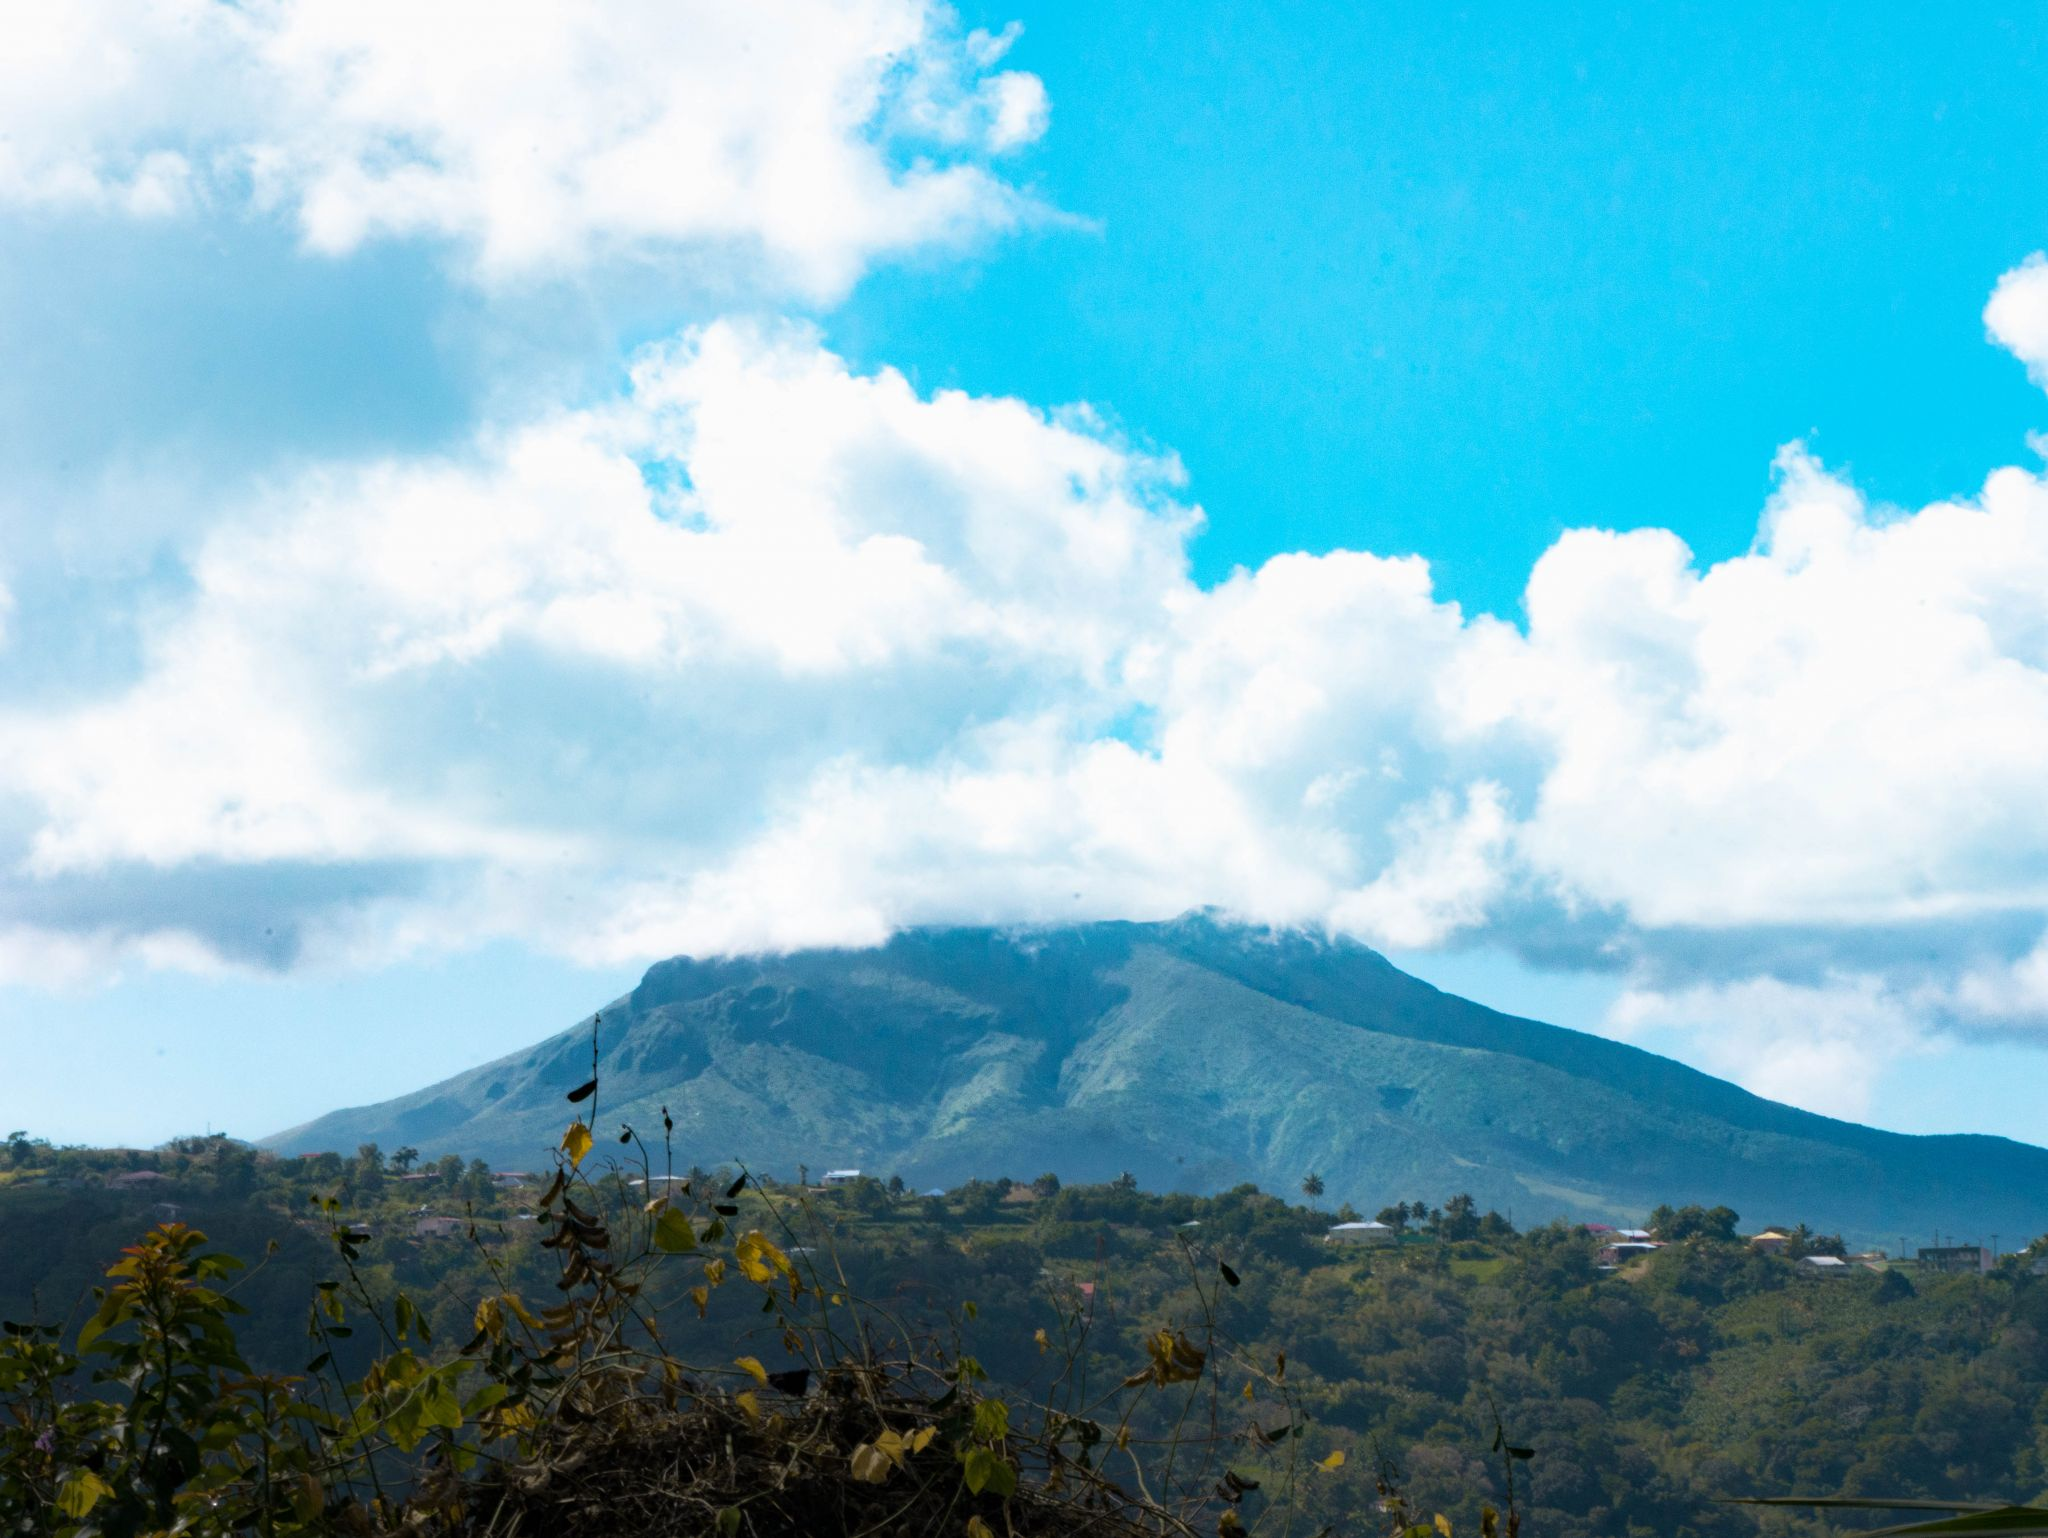 View of the Montagne Pelée from Marigot, Martinique